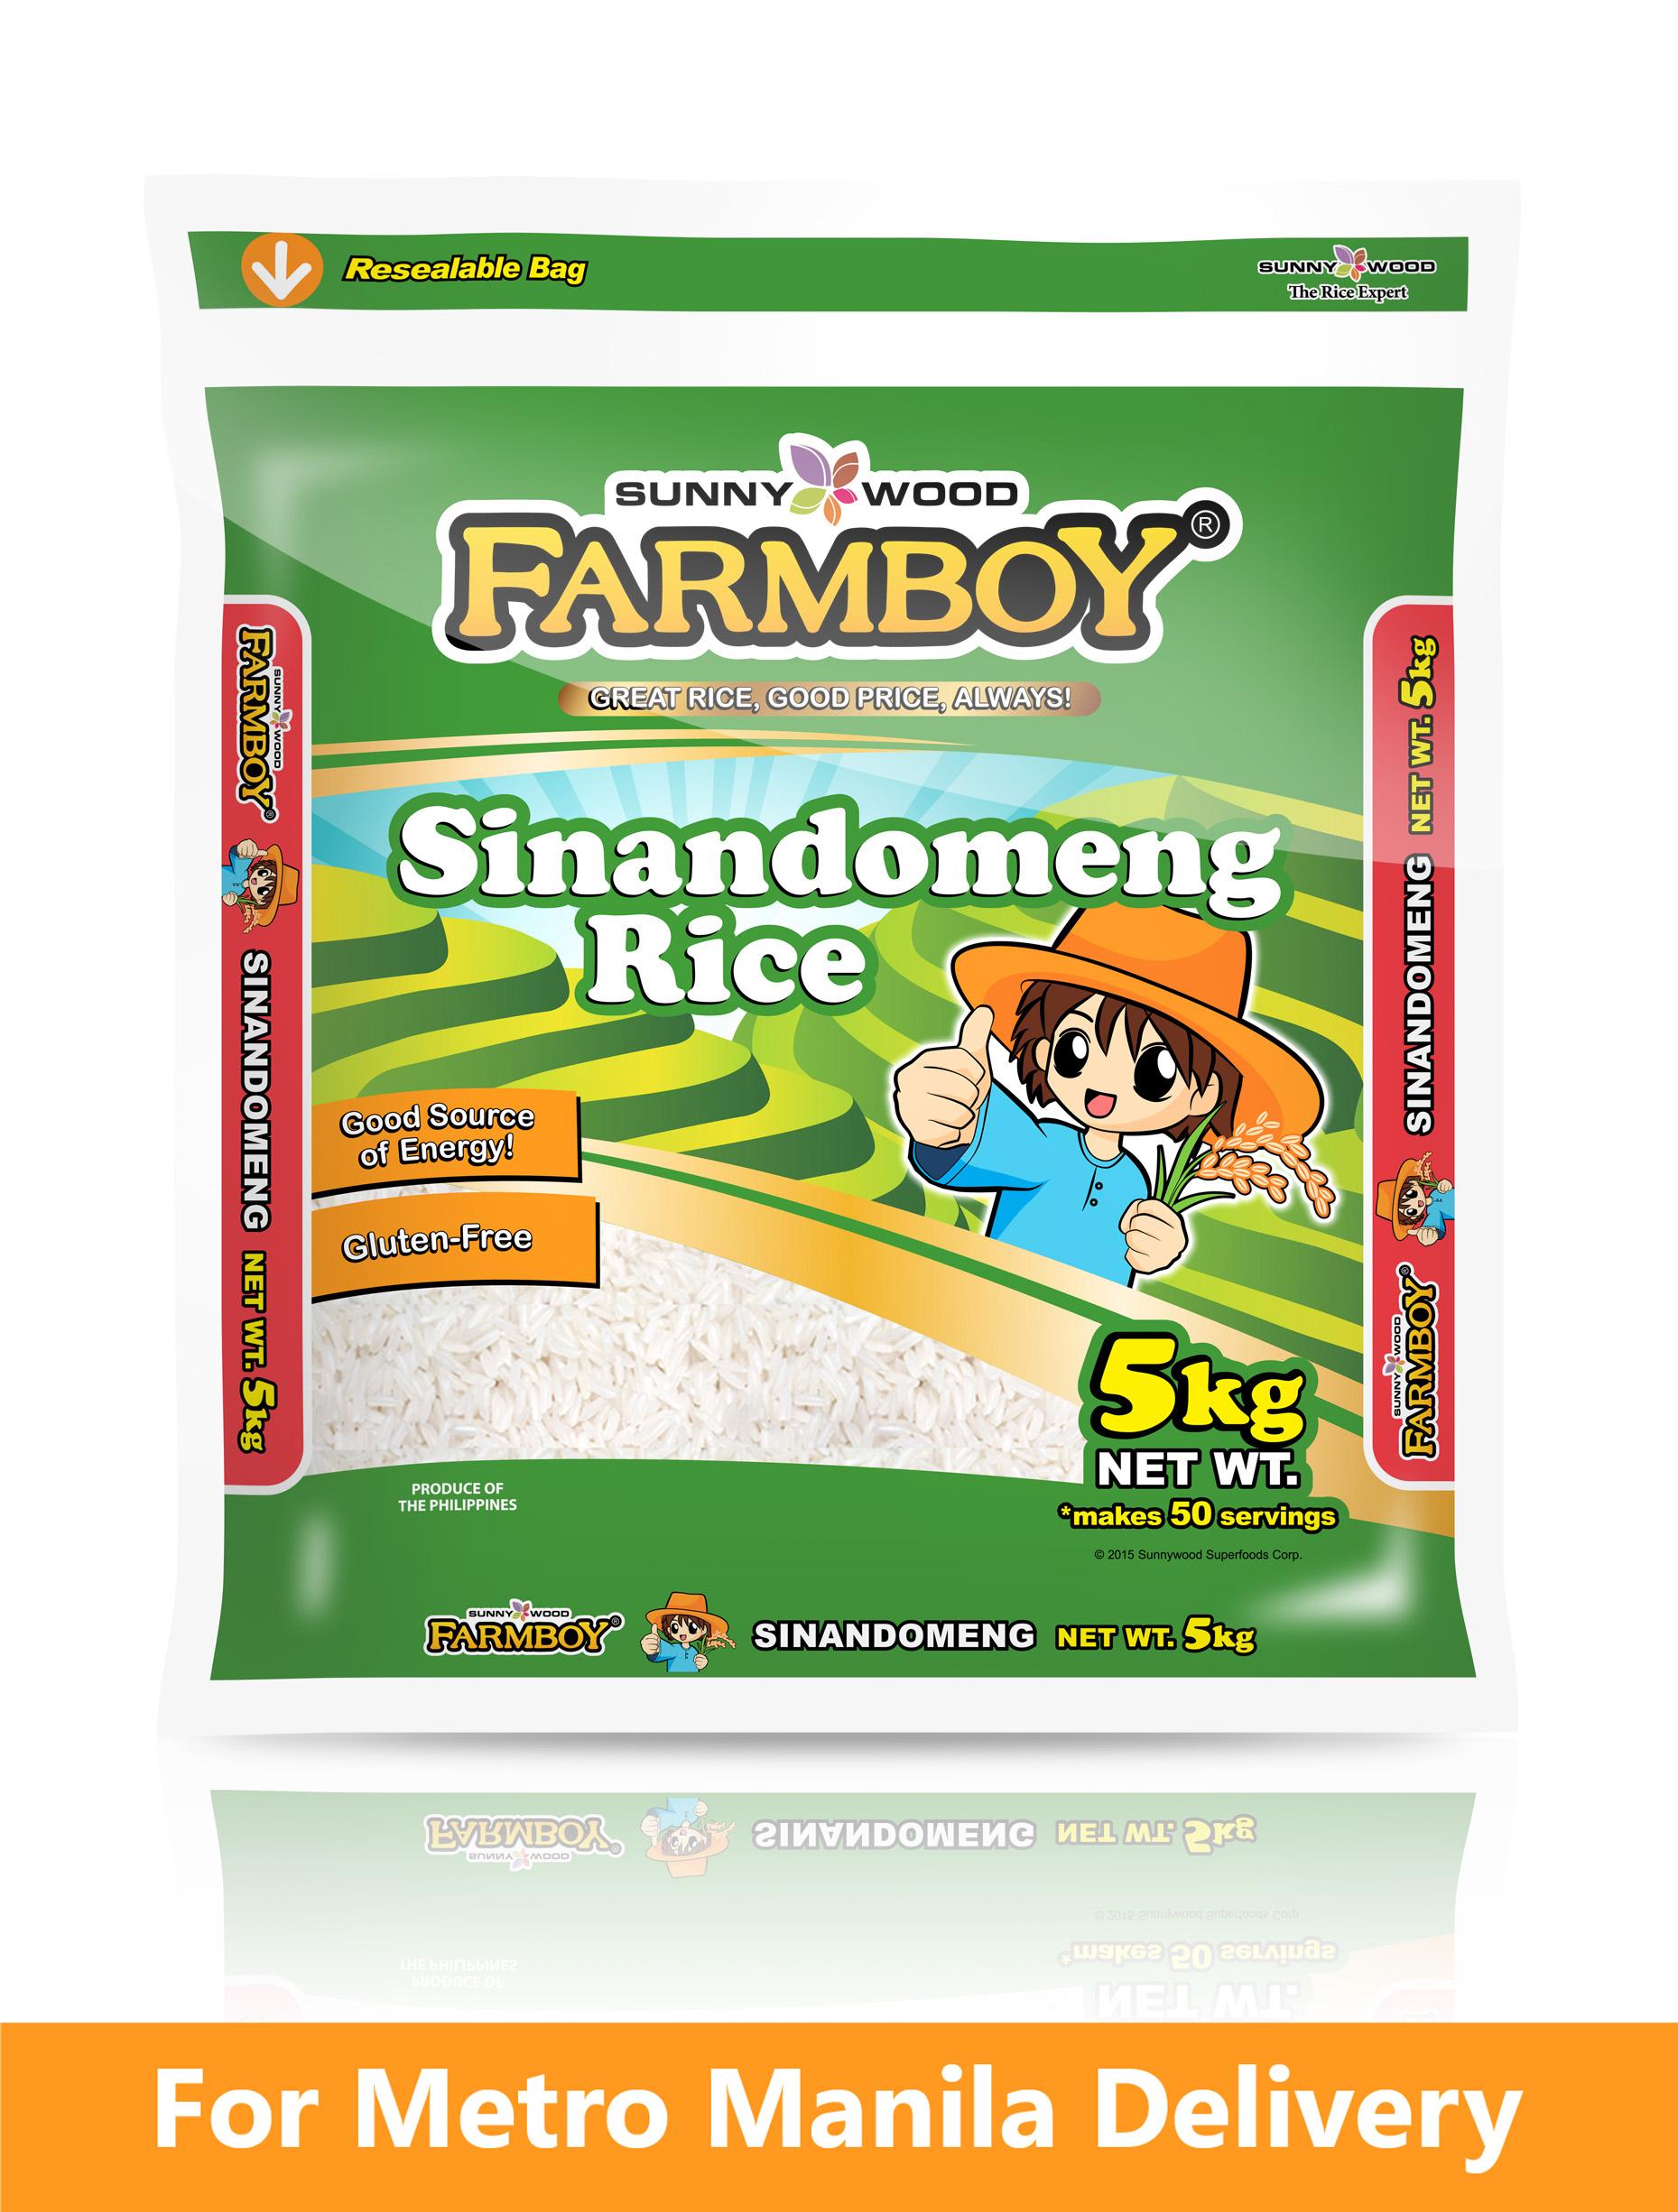 FARMBOY Sinandomeng- 5kg